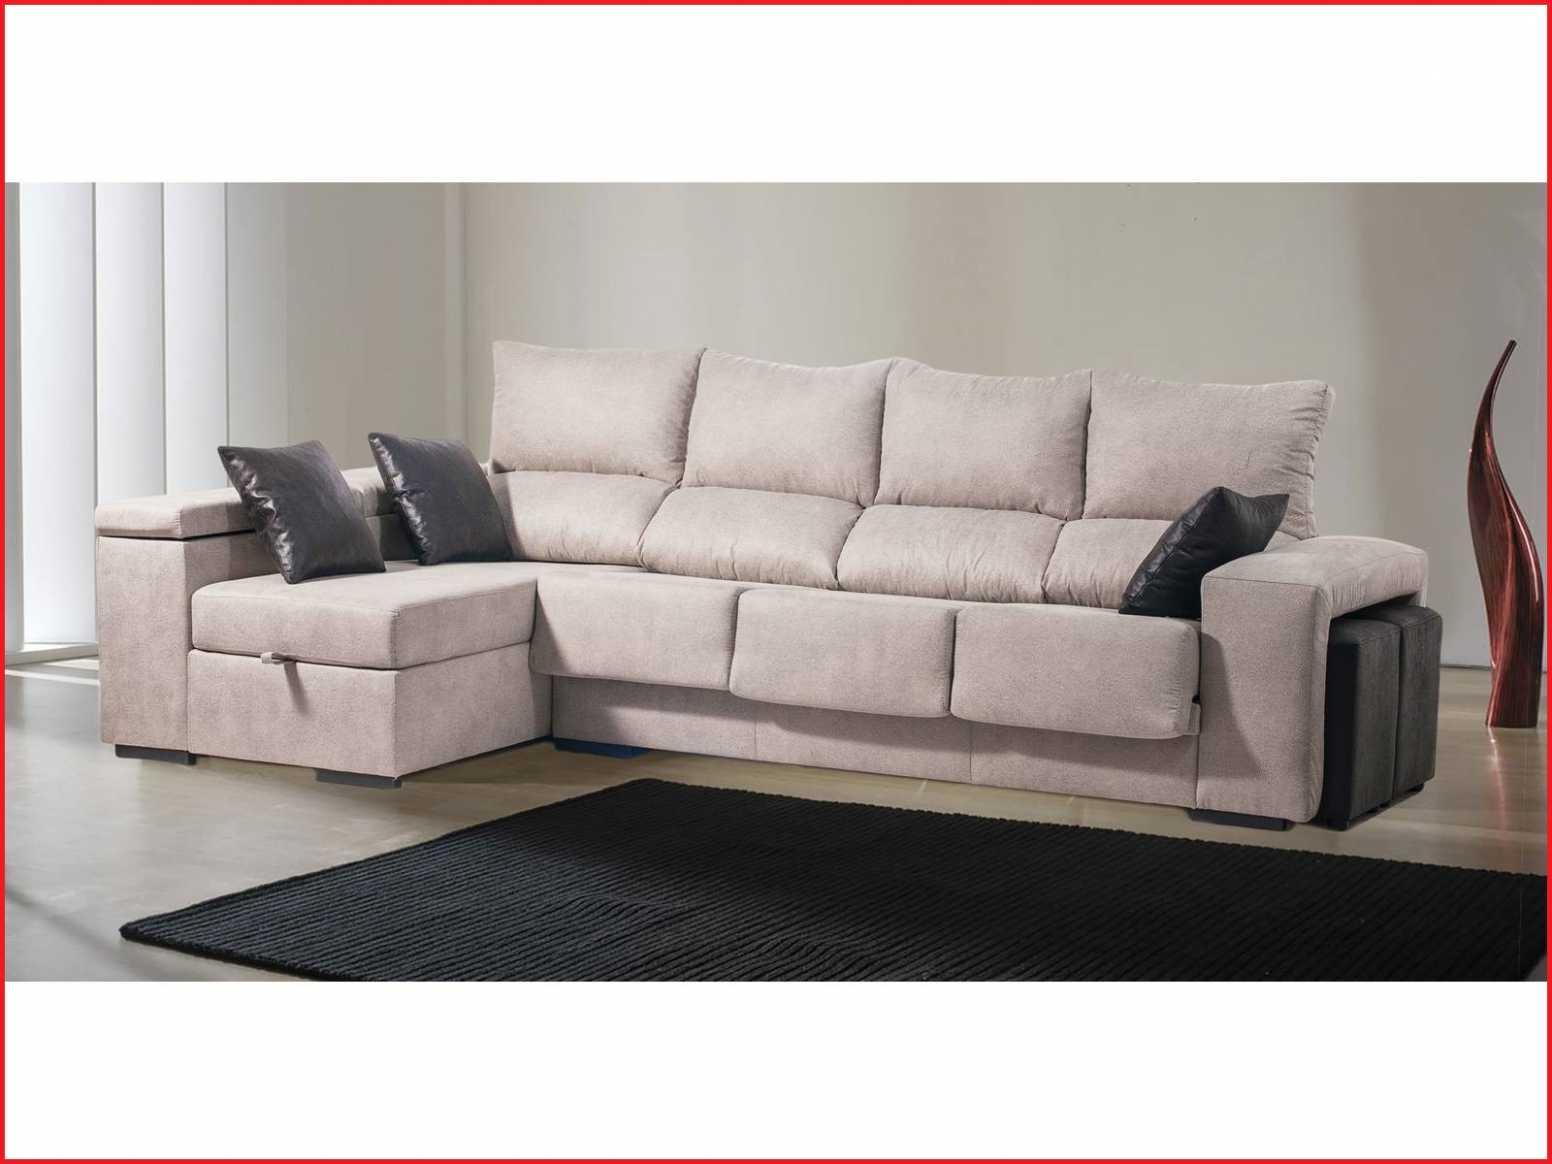 Sofa Cama Merkamueble Etdg sofa Cama Merkamueble 10 sofa Cama Individual Segunda Mano En